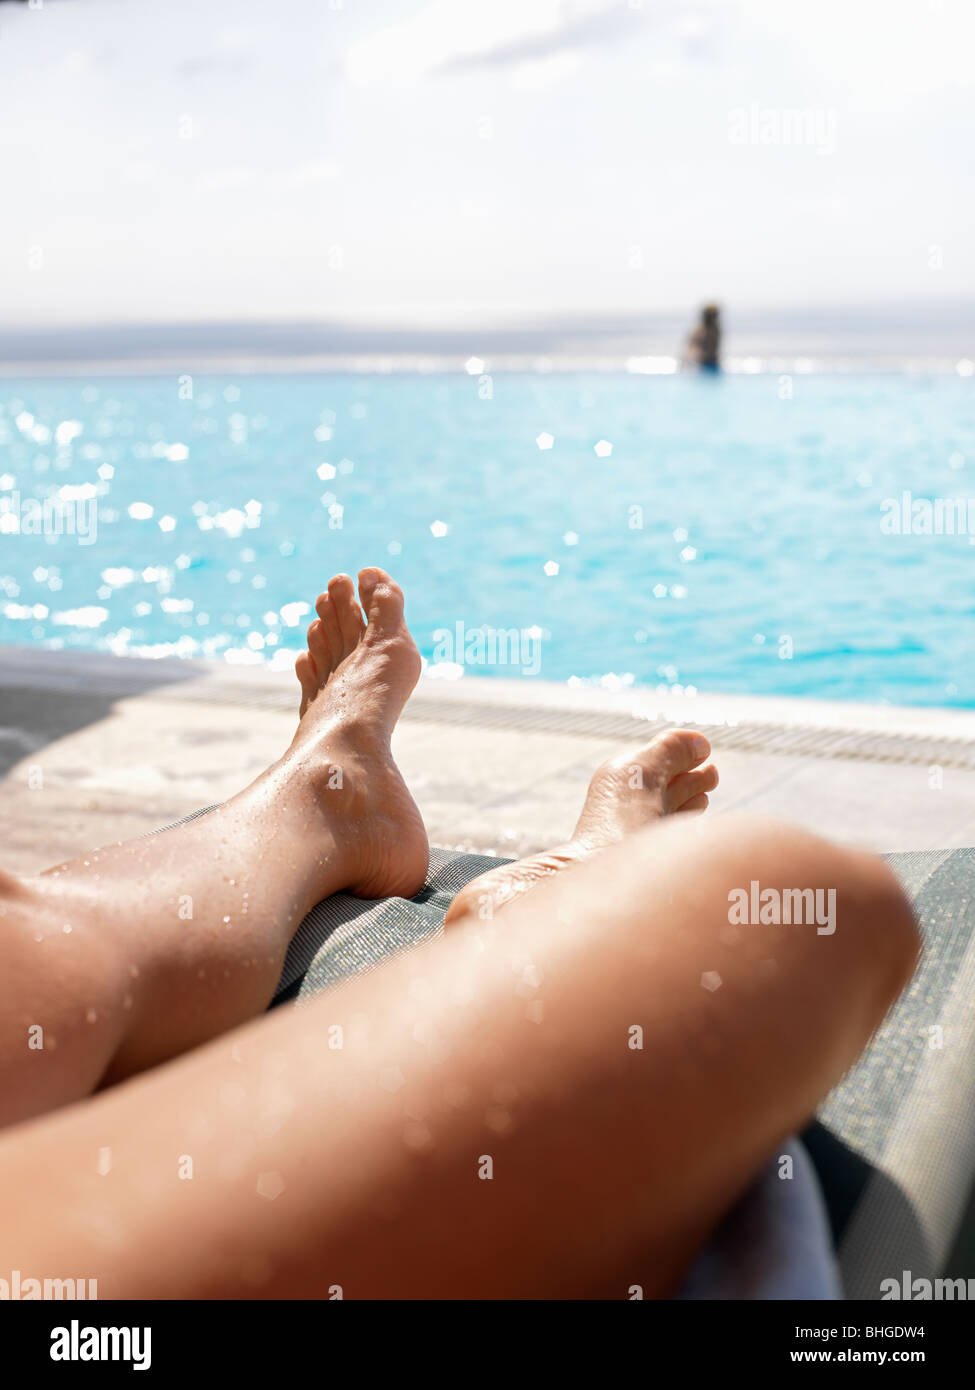 Woman sunbathing by a swimming-pool, Turkey. - Stock Image